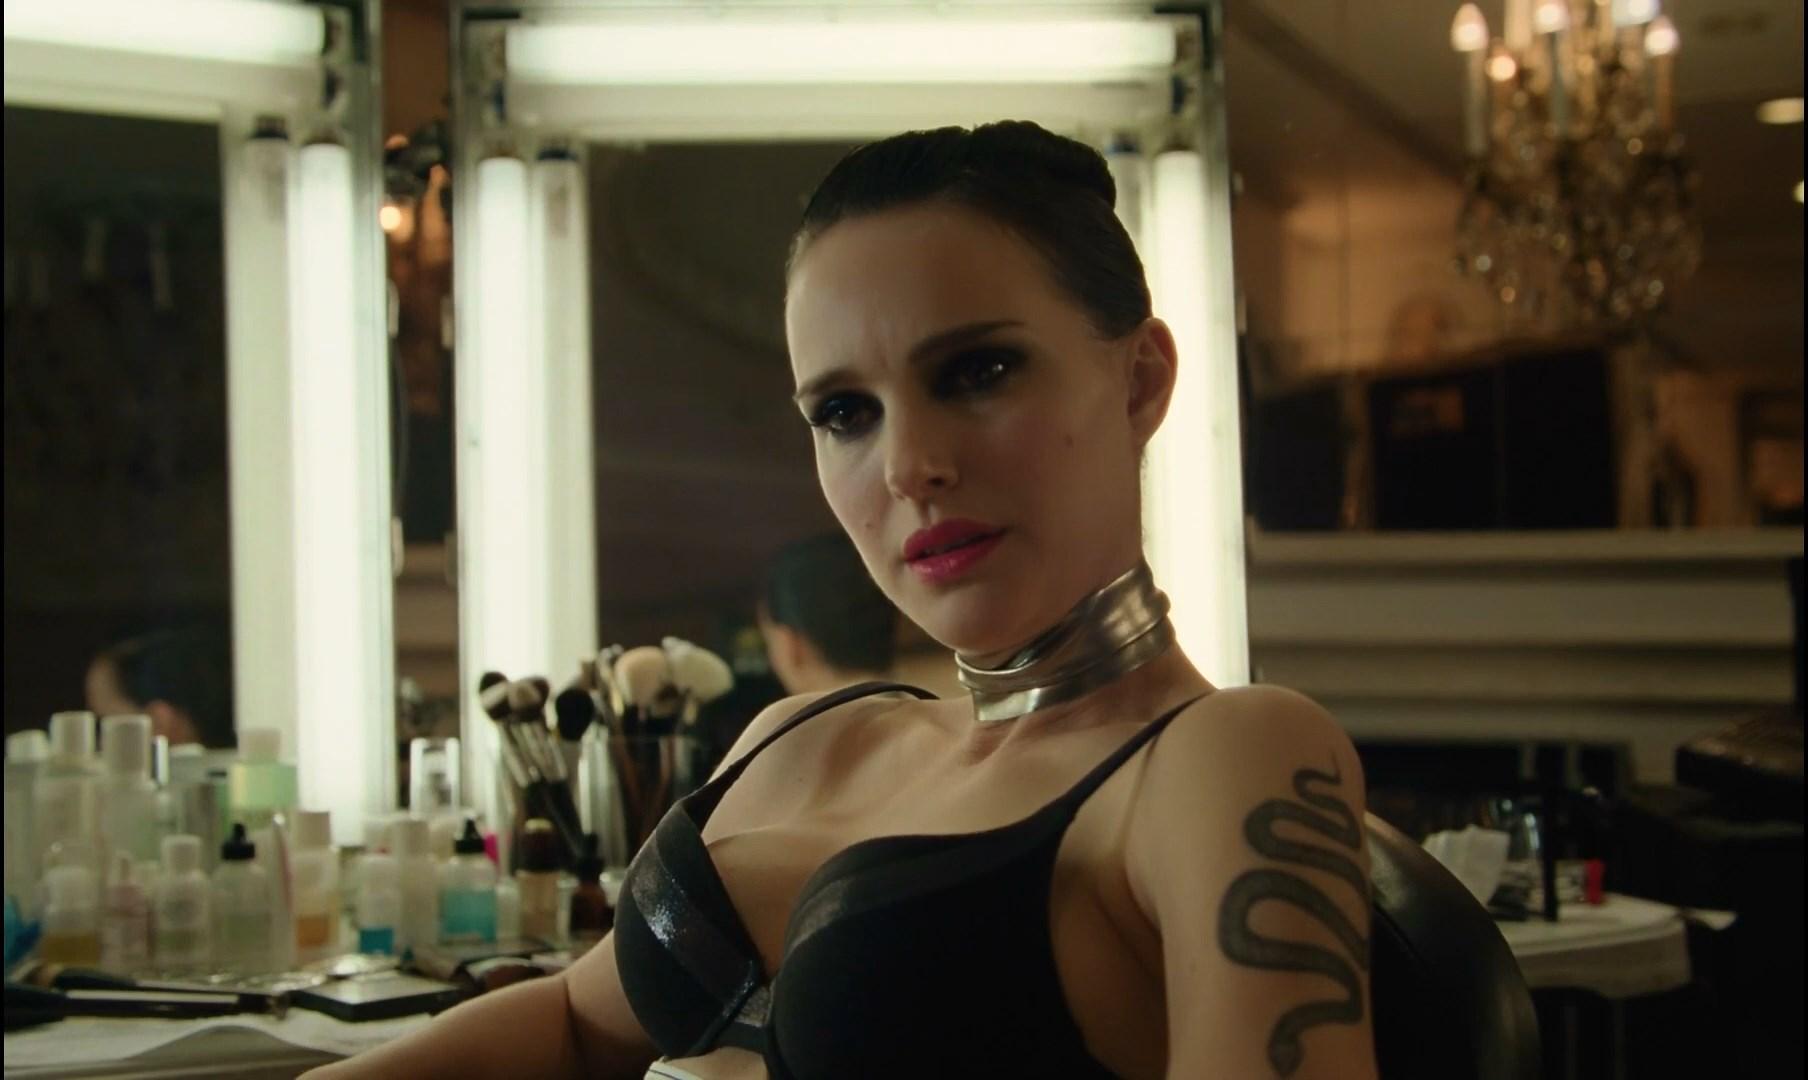 nude video celebs » actress » natalie portman